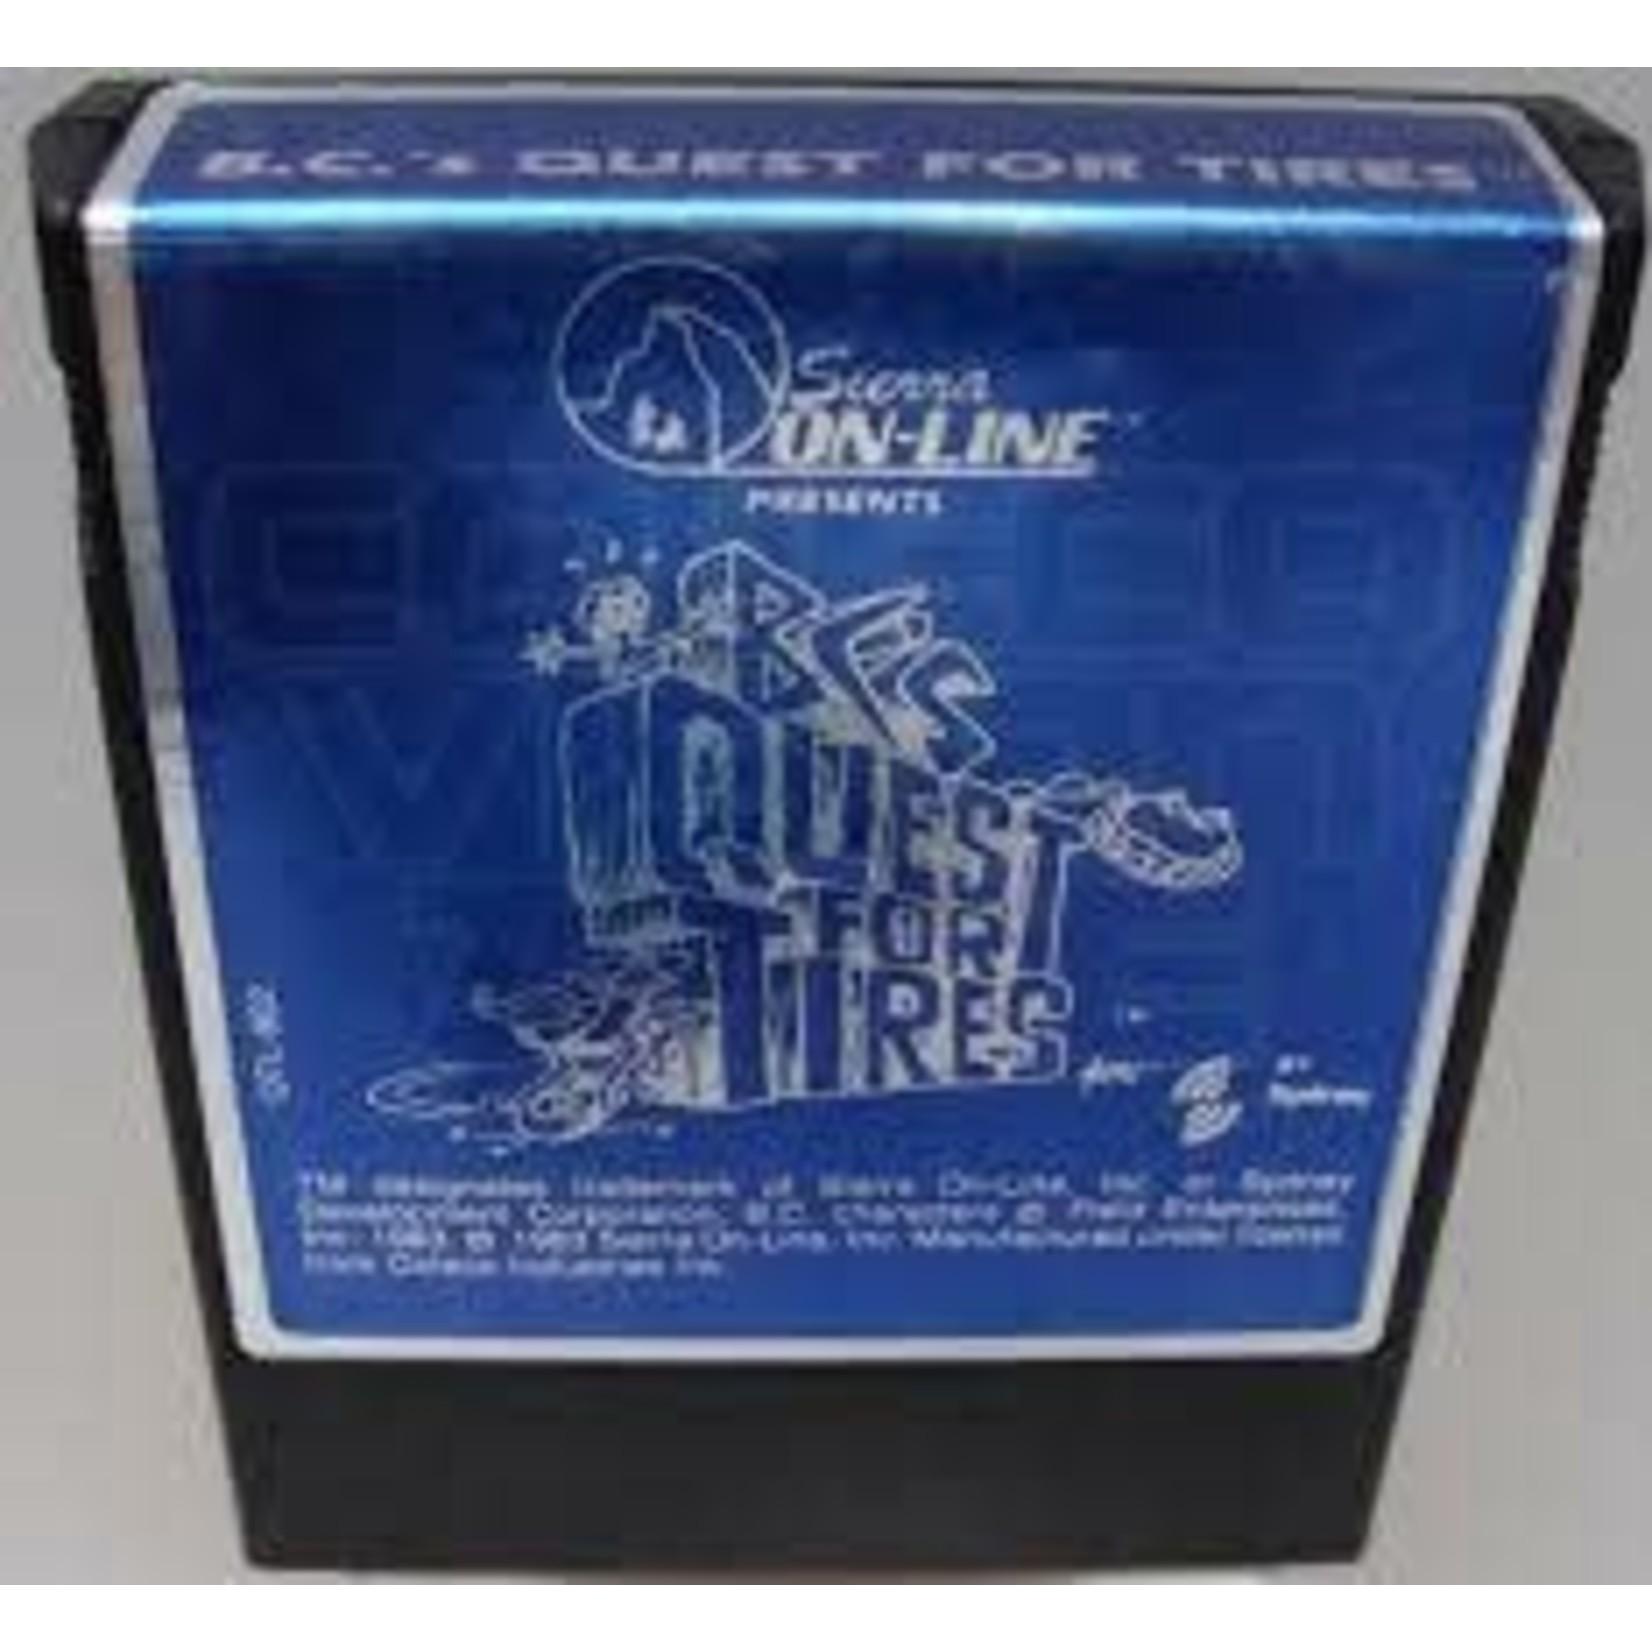 cvu-B.C.'S Quest For Tires (cart only)